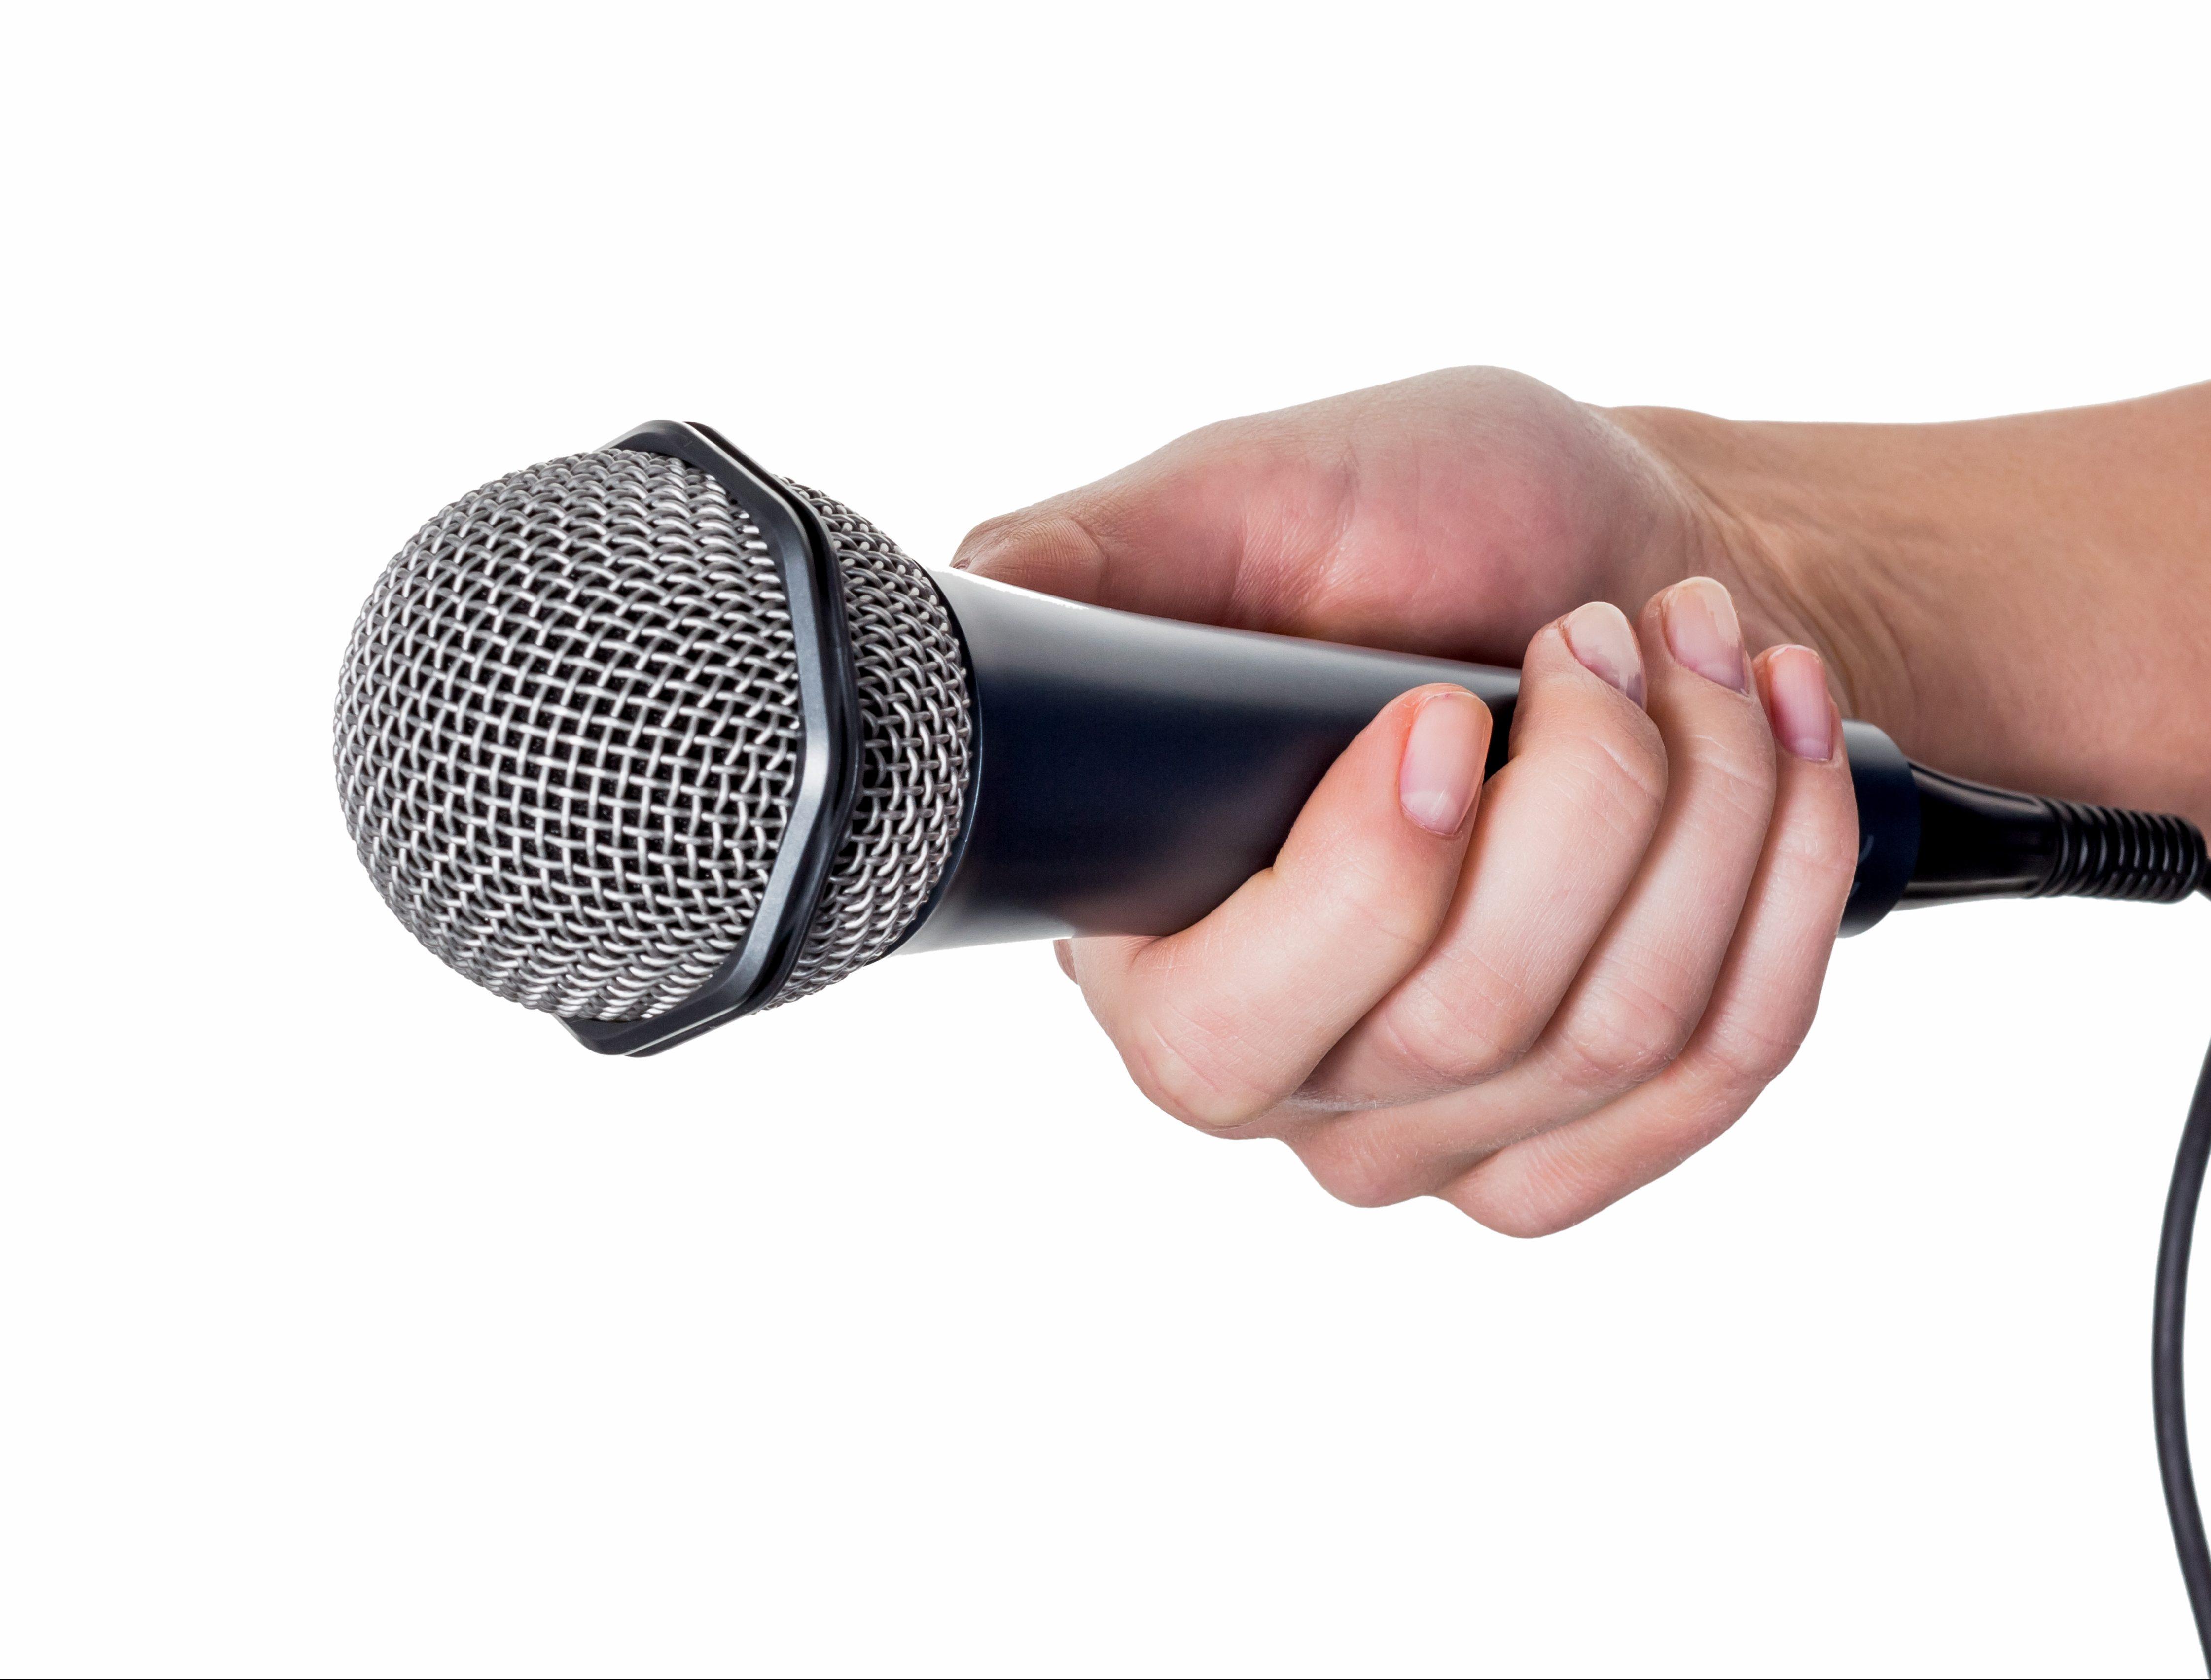 Google v. Oracle roundup - https://depositphotos.com/69798509/stock-photo-woman-holding-microphone.html